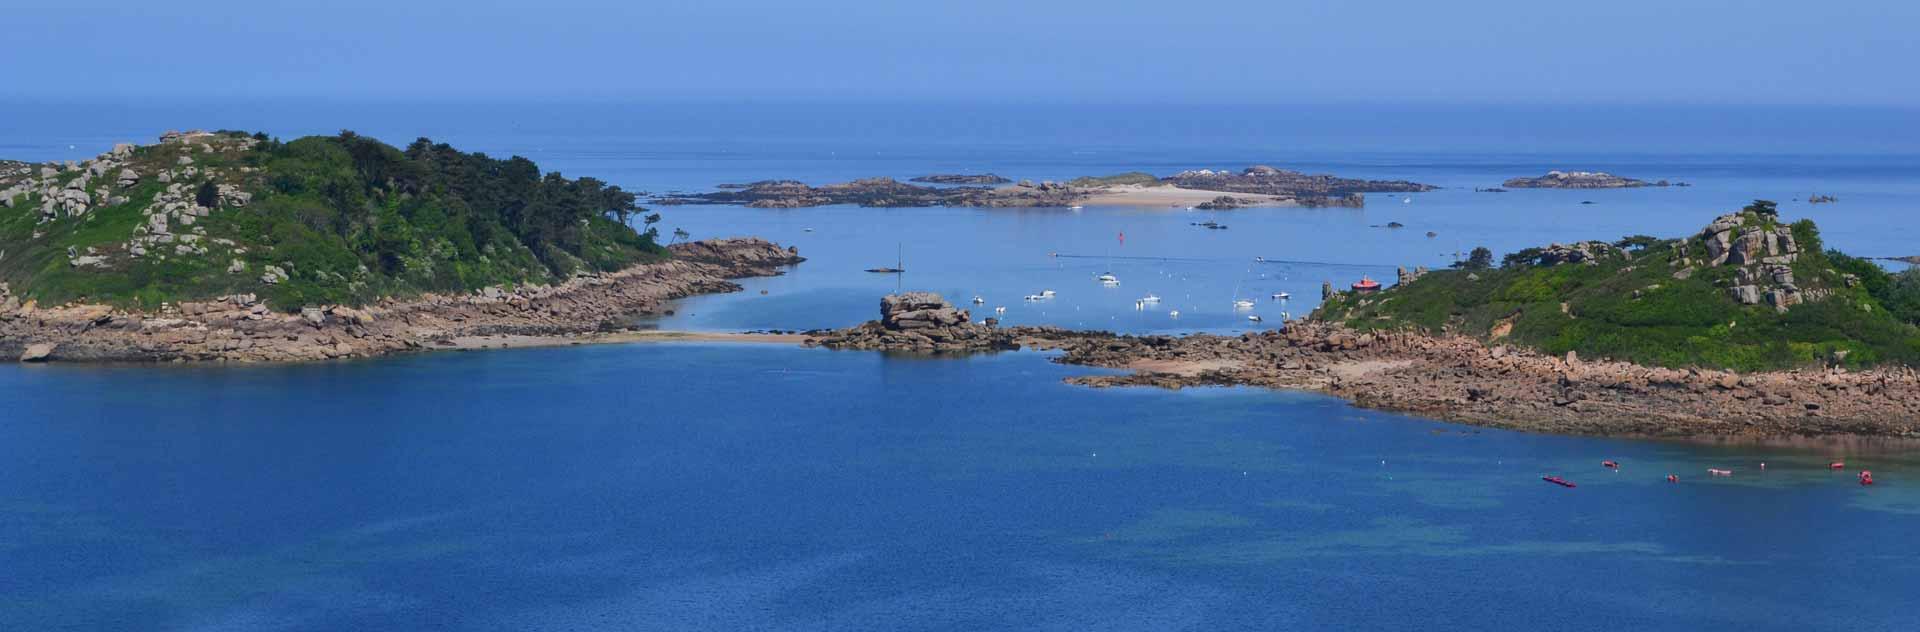 Panorama trébeurden Tresmeur, île Milliau et Molène